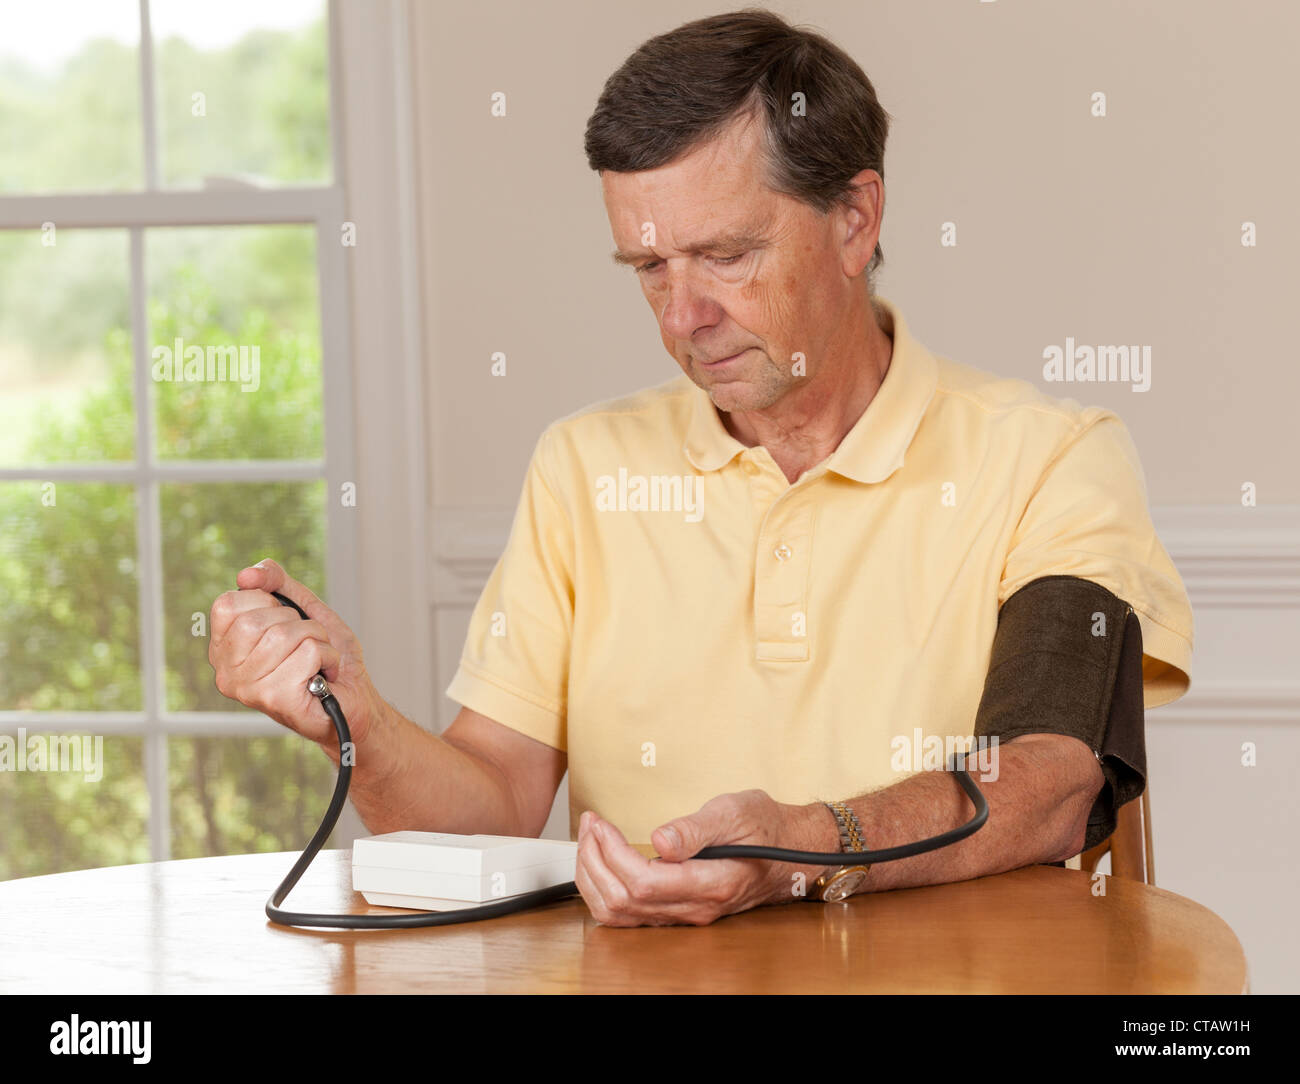 Senior caucasian retired male taking blood pressure at home - Stock Image